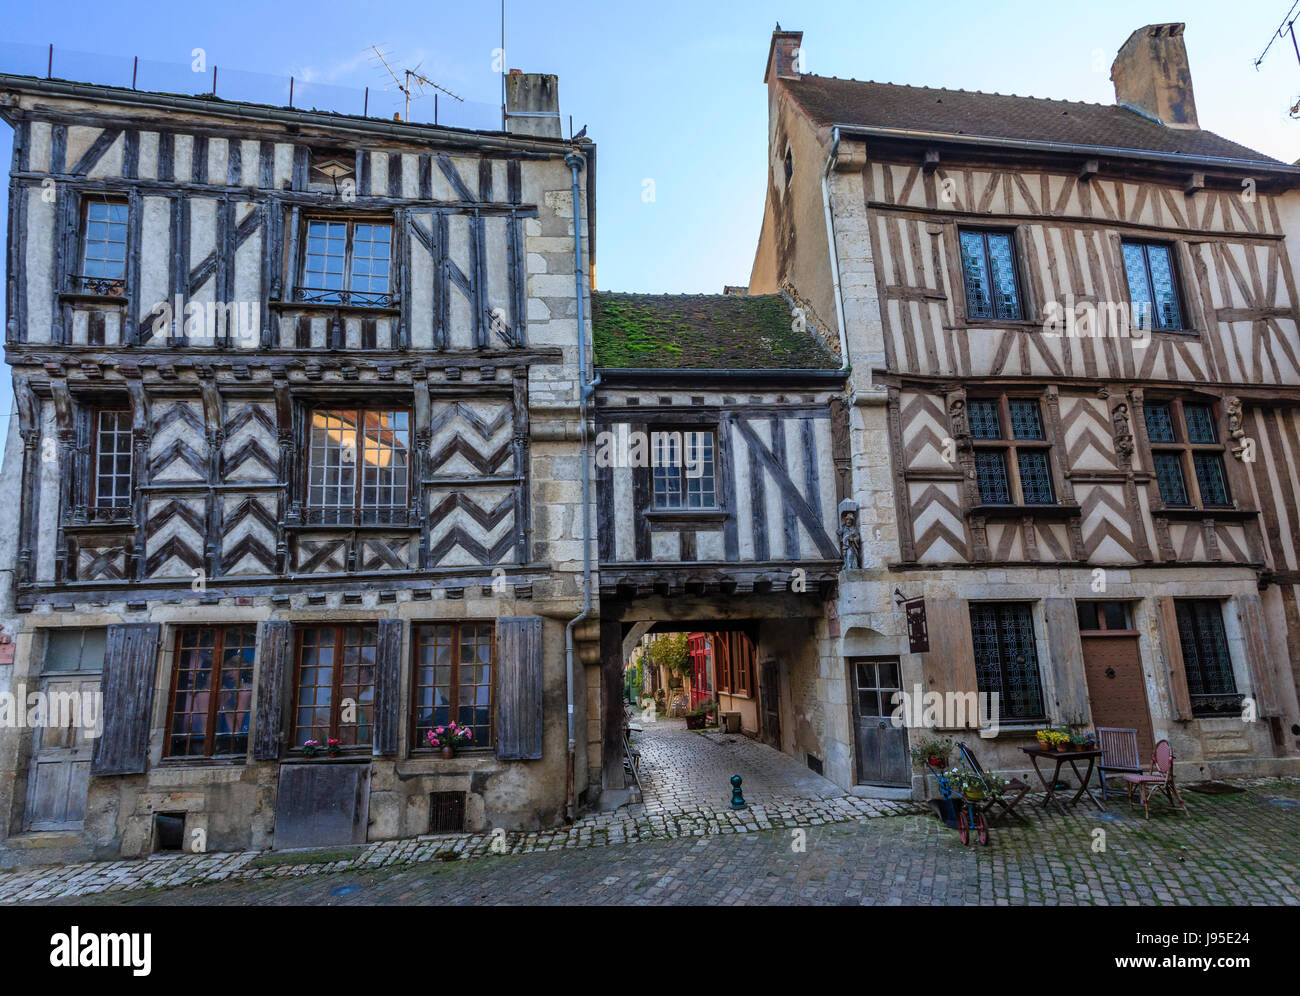 France, Yonne, Noyers or Noyers sur Serein, labelled Les Plus Beaux Villages de France, wood framed houses on the - Stock Image